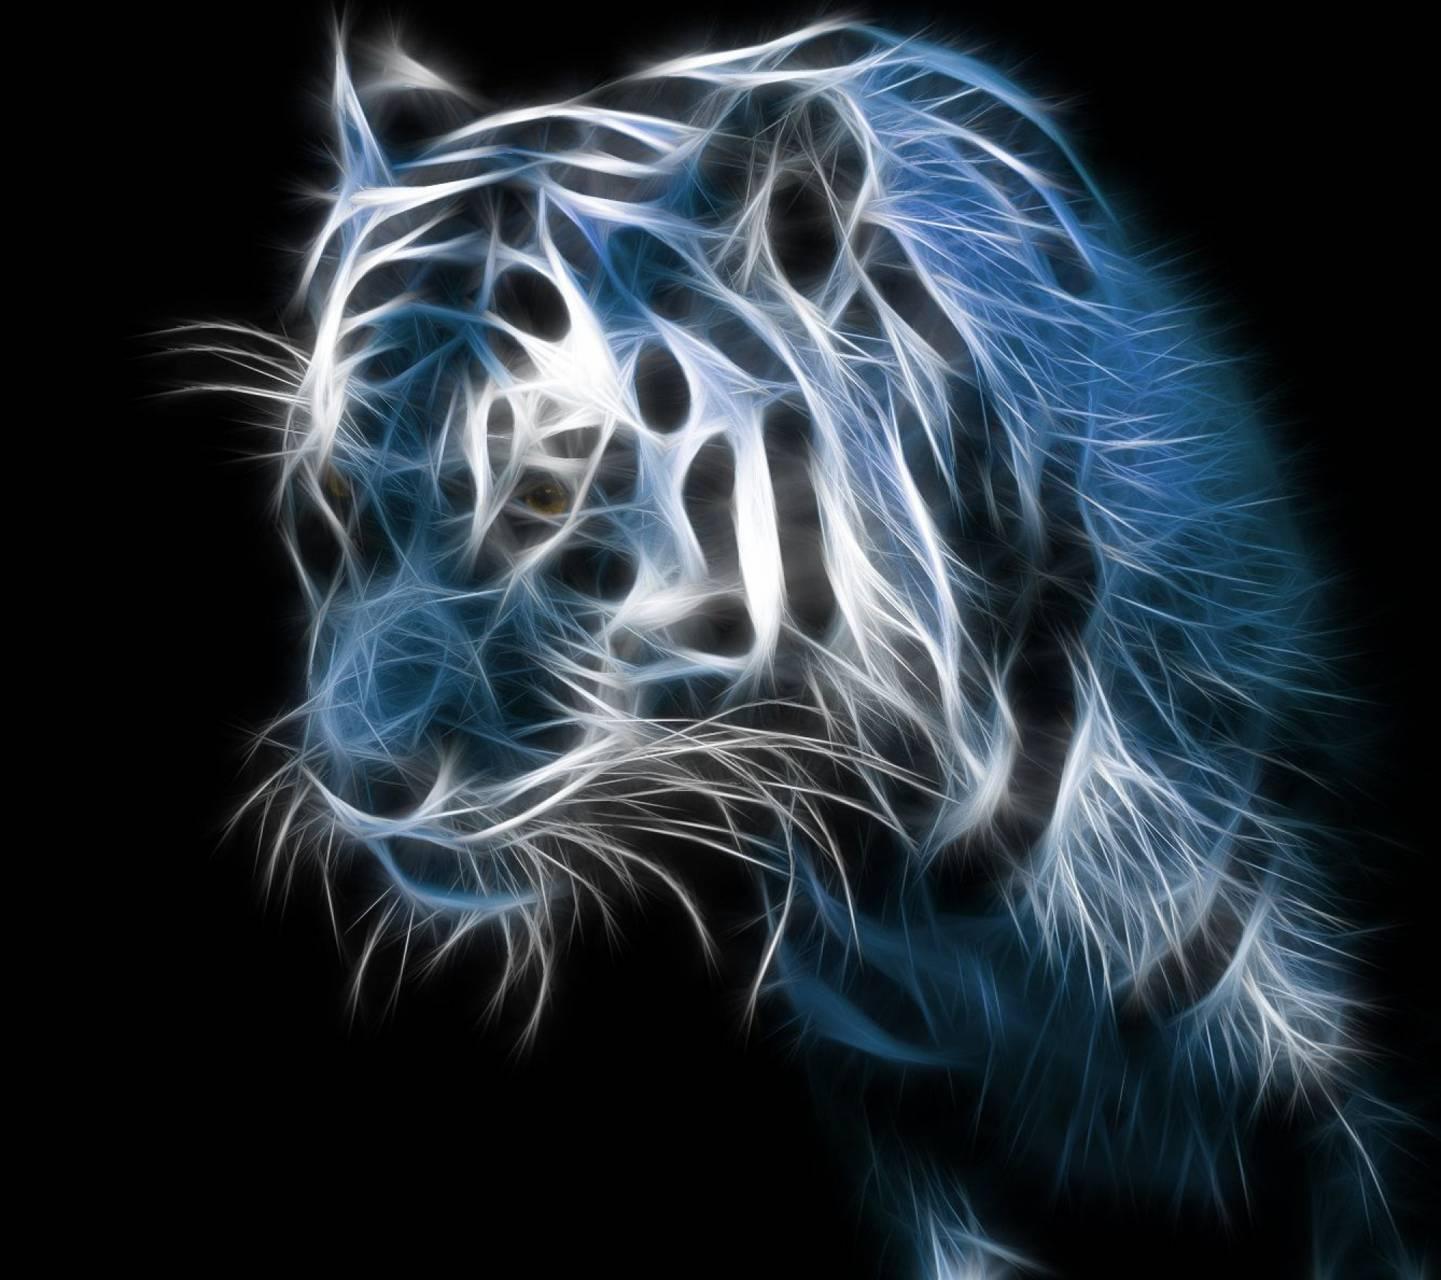 Cool Tiger Wallpaper By Rewsss2